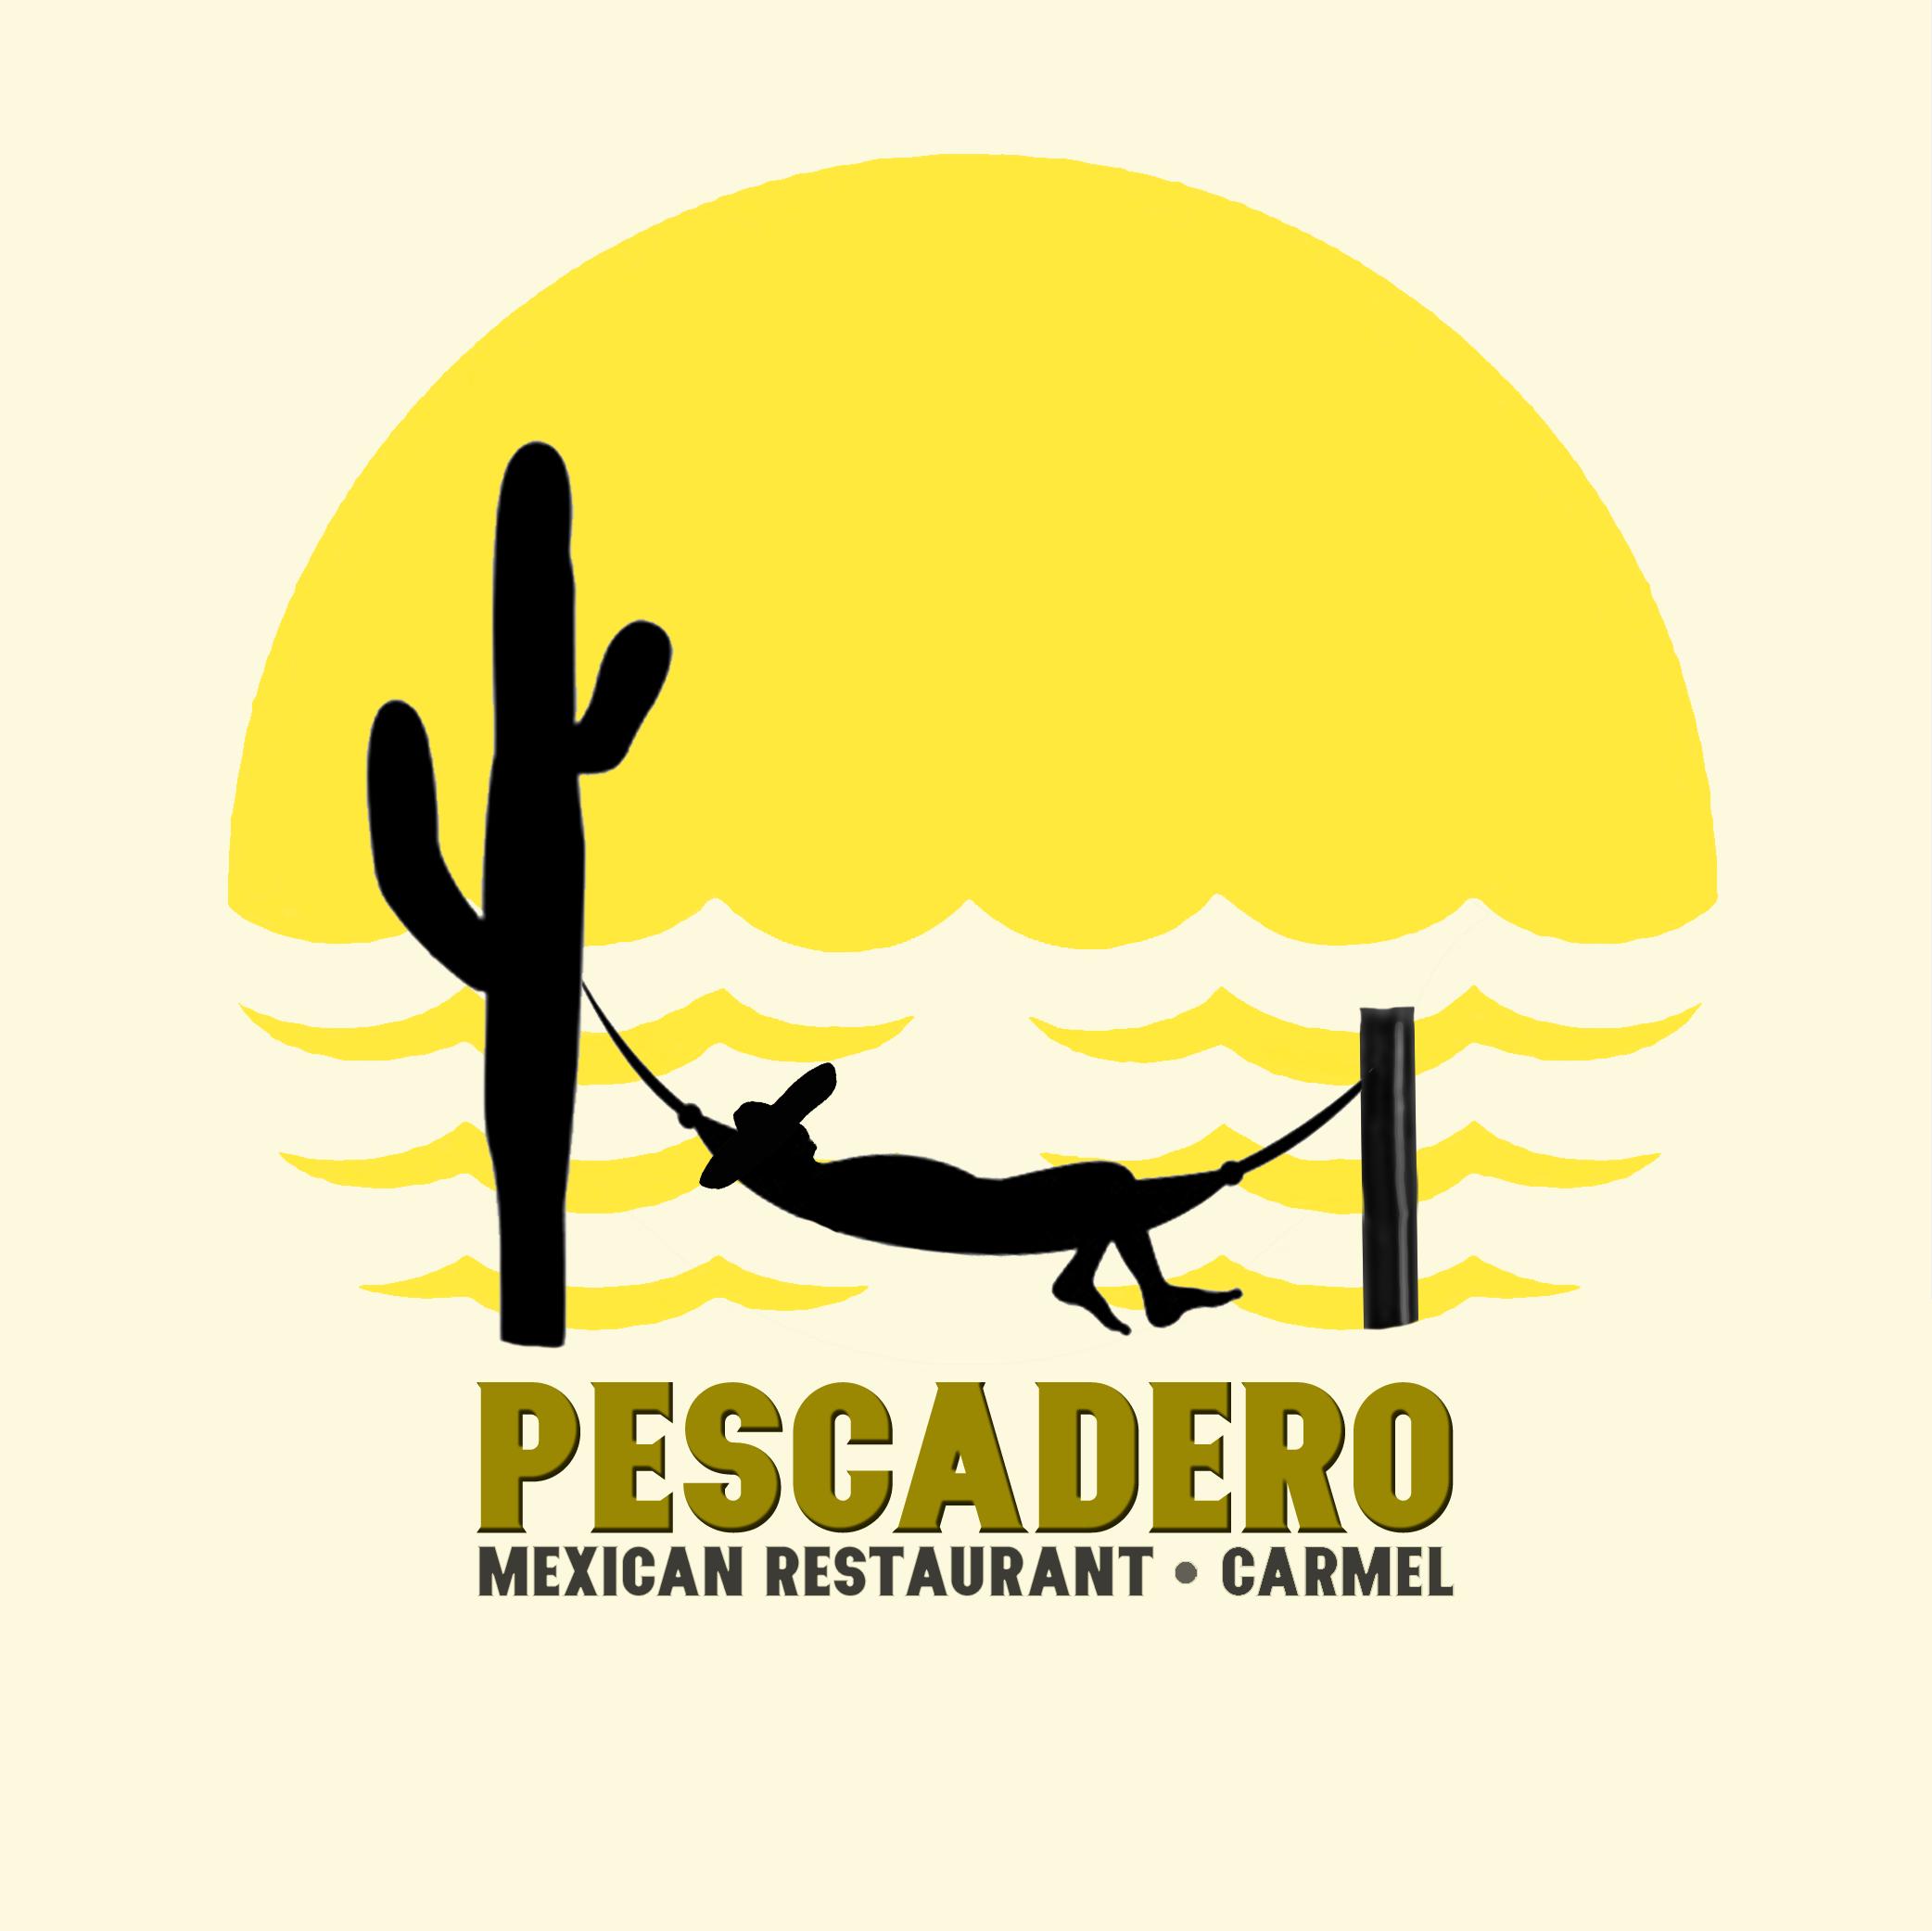 Pescadero Carmel - COPY